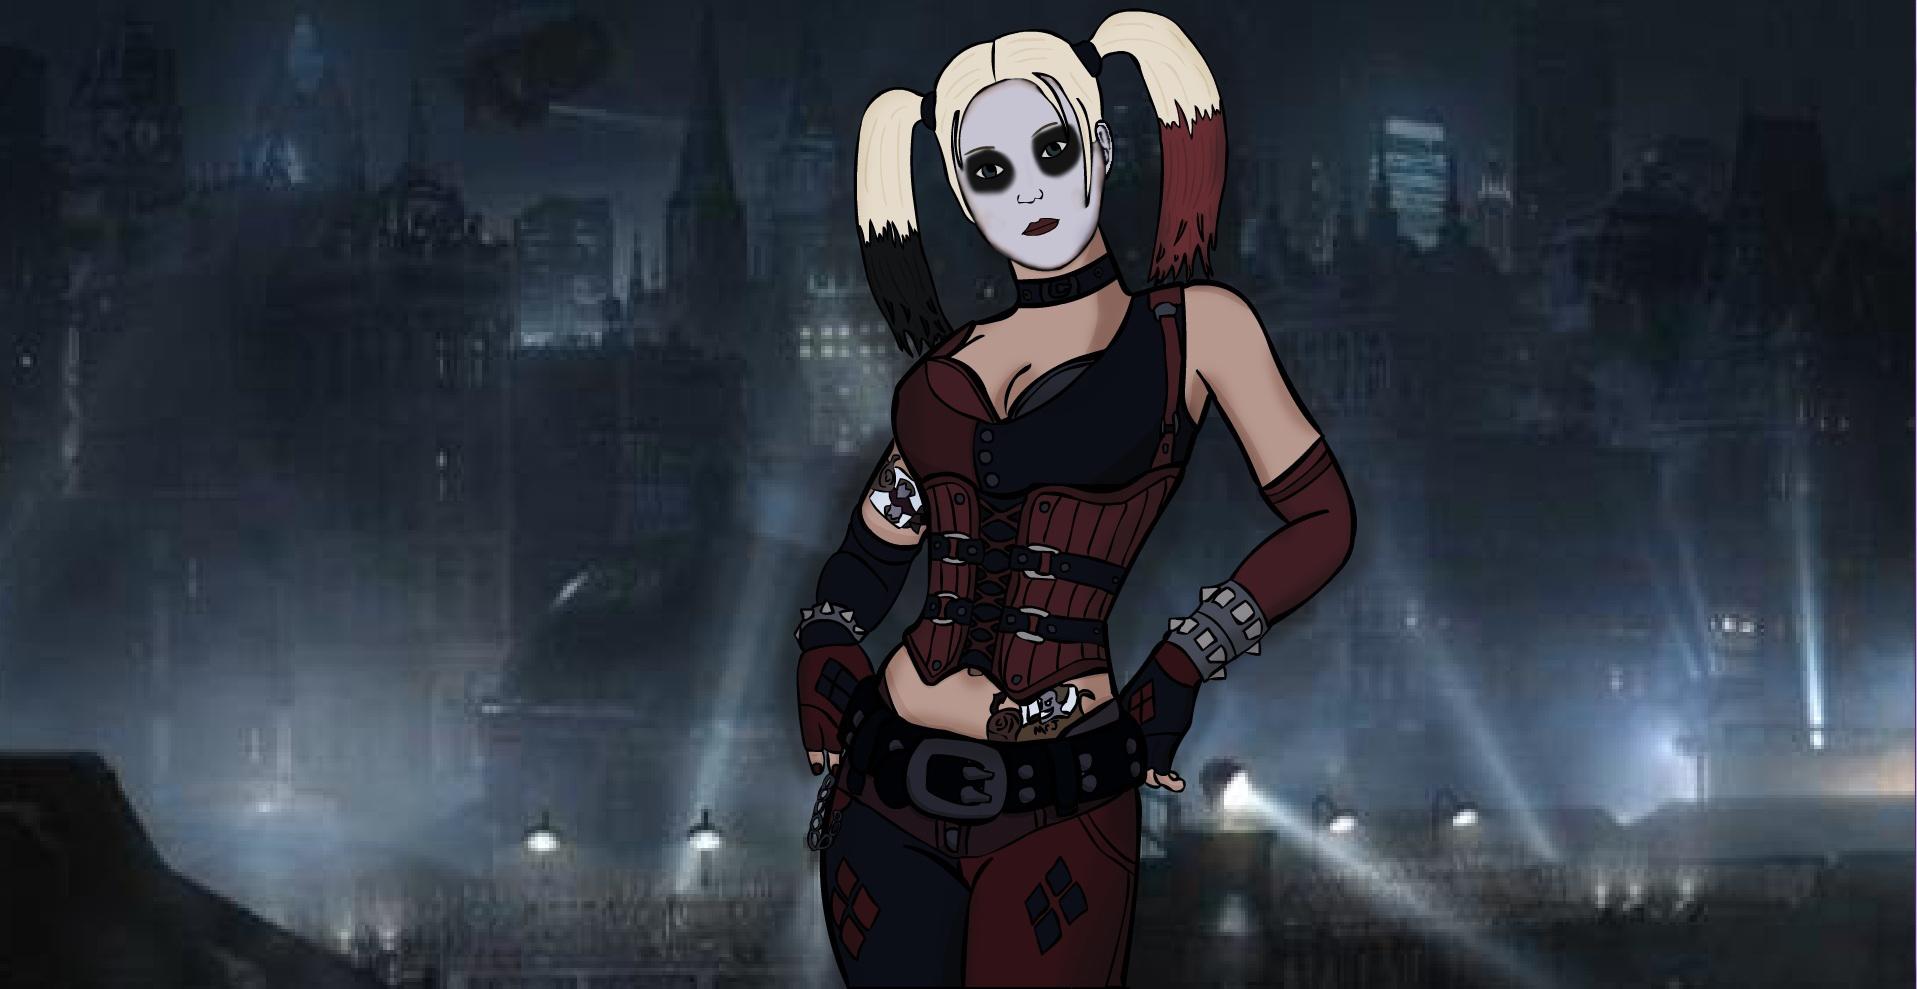 Harley Quinn Arkham City By Dark Link 2391 On Deviantart